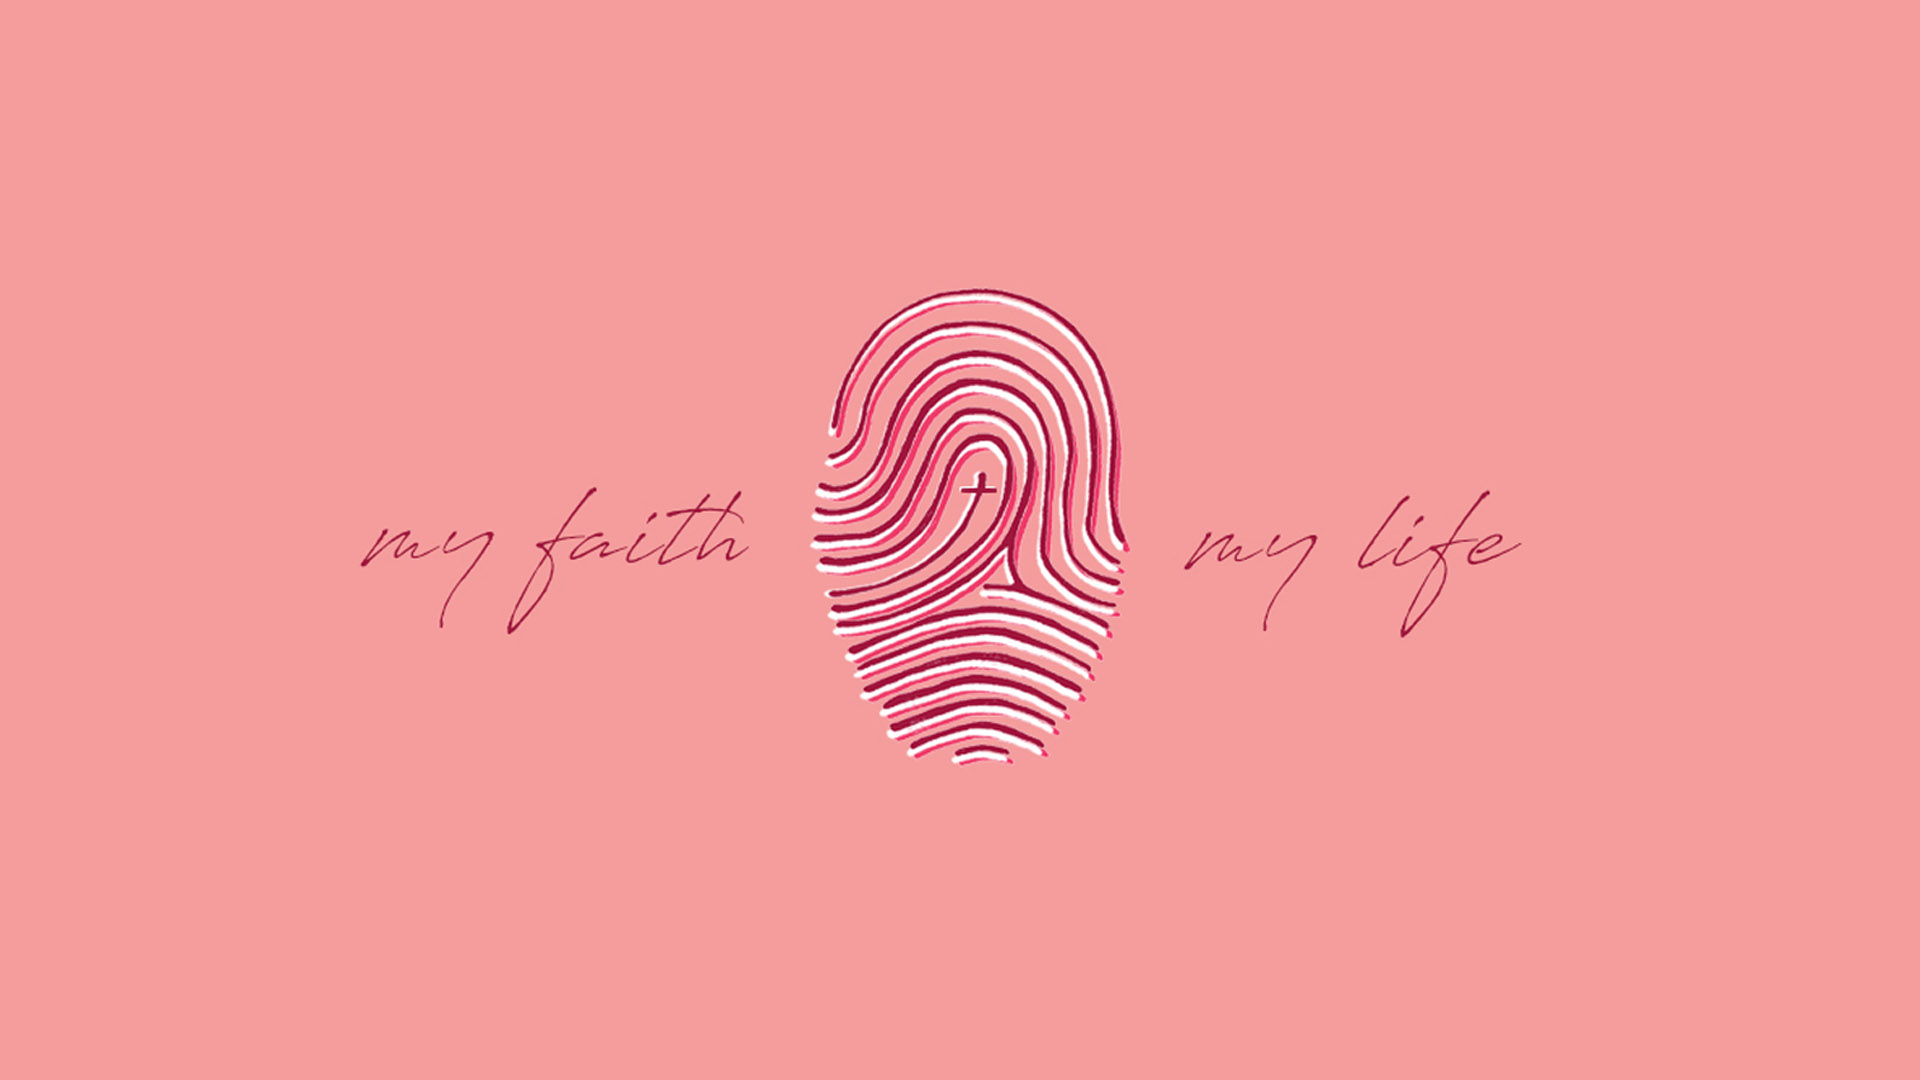 st-johns-harborne-sermon-series-my-faith-my-life-web.jpg